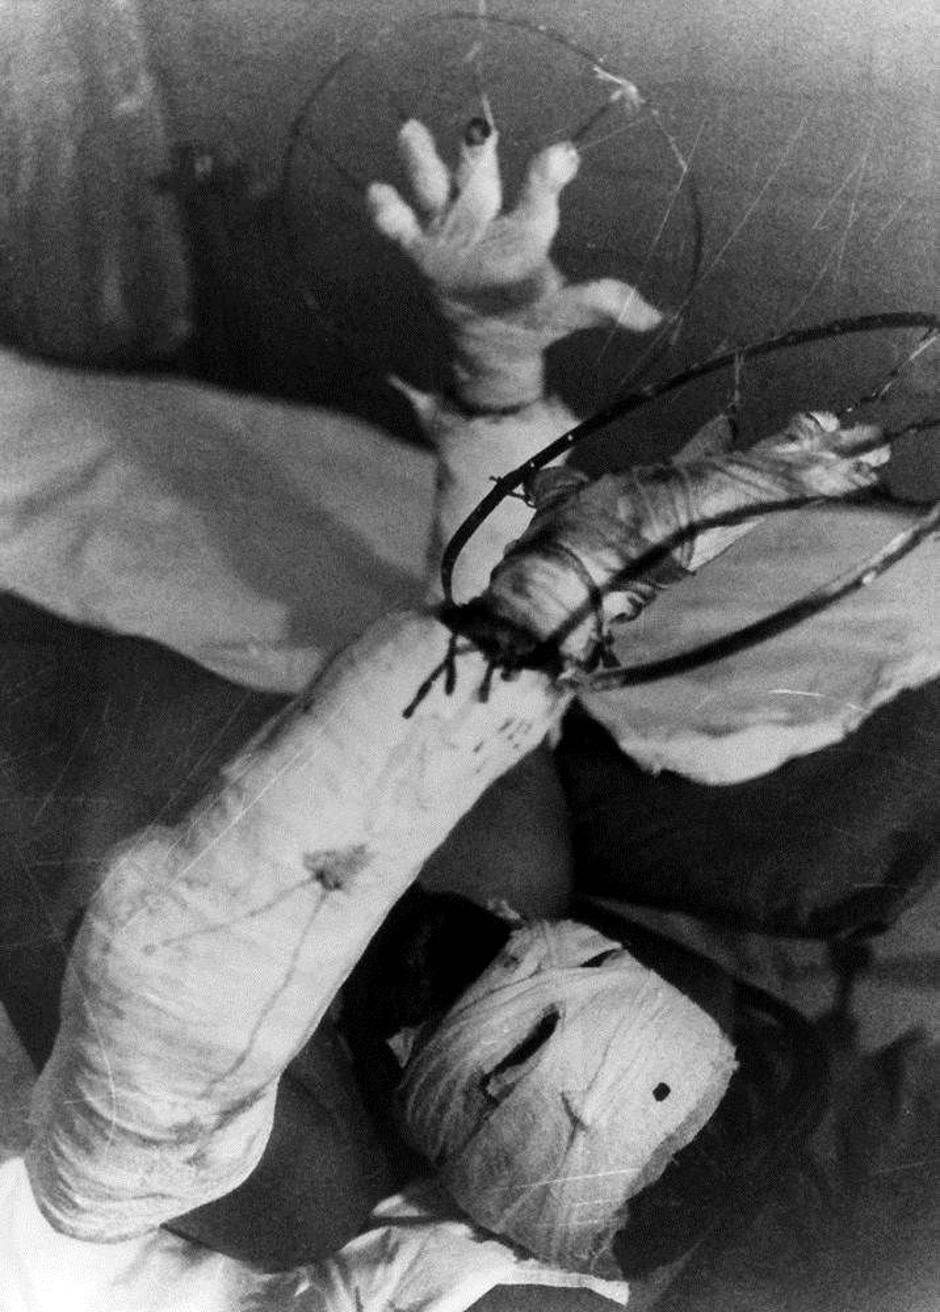 Špkantne fotografije iz Černobila | Author: screenshot